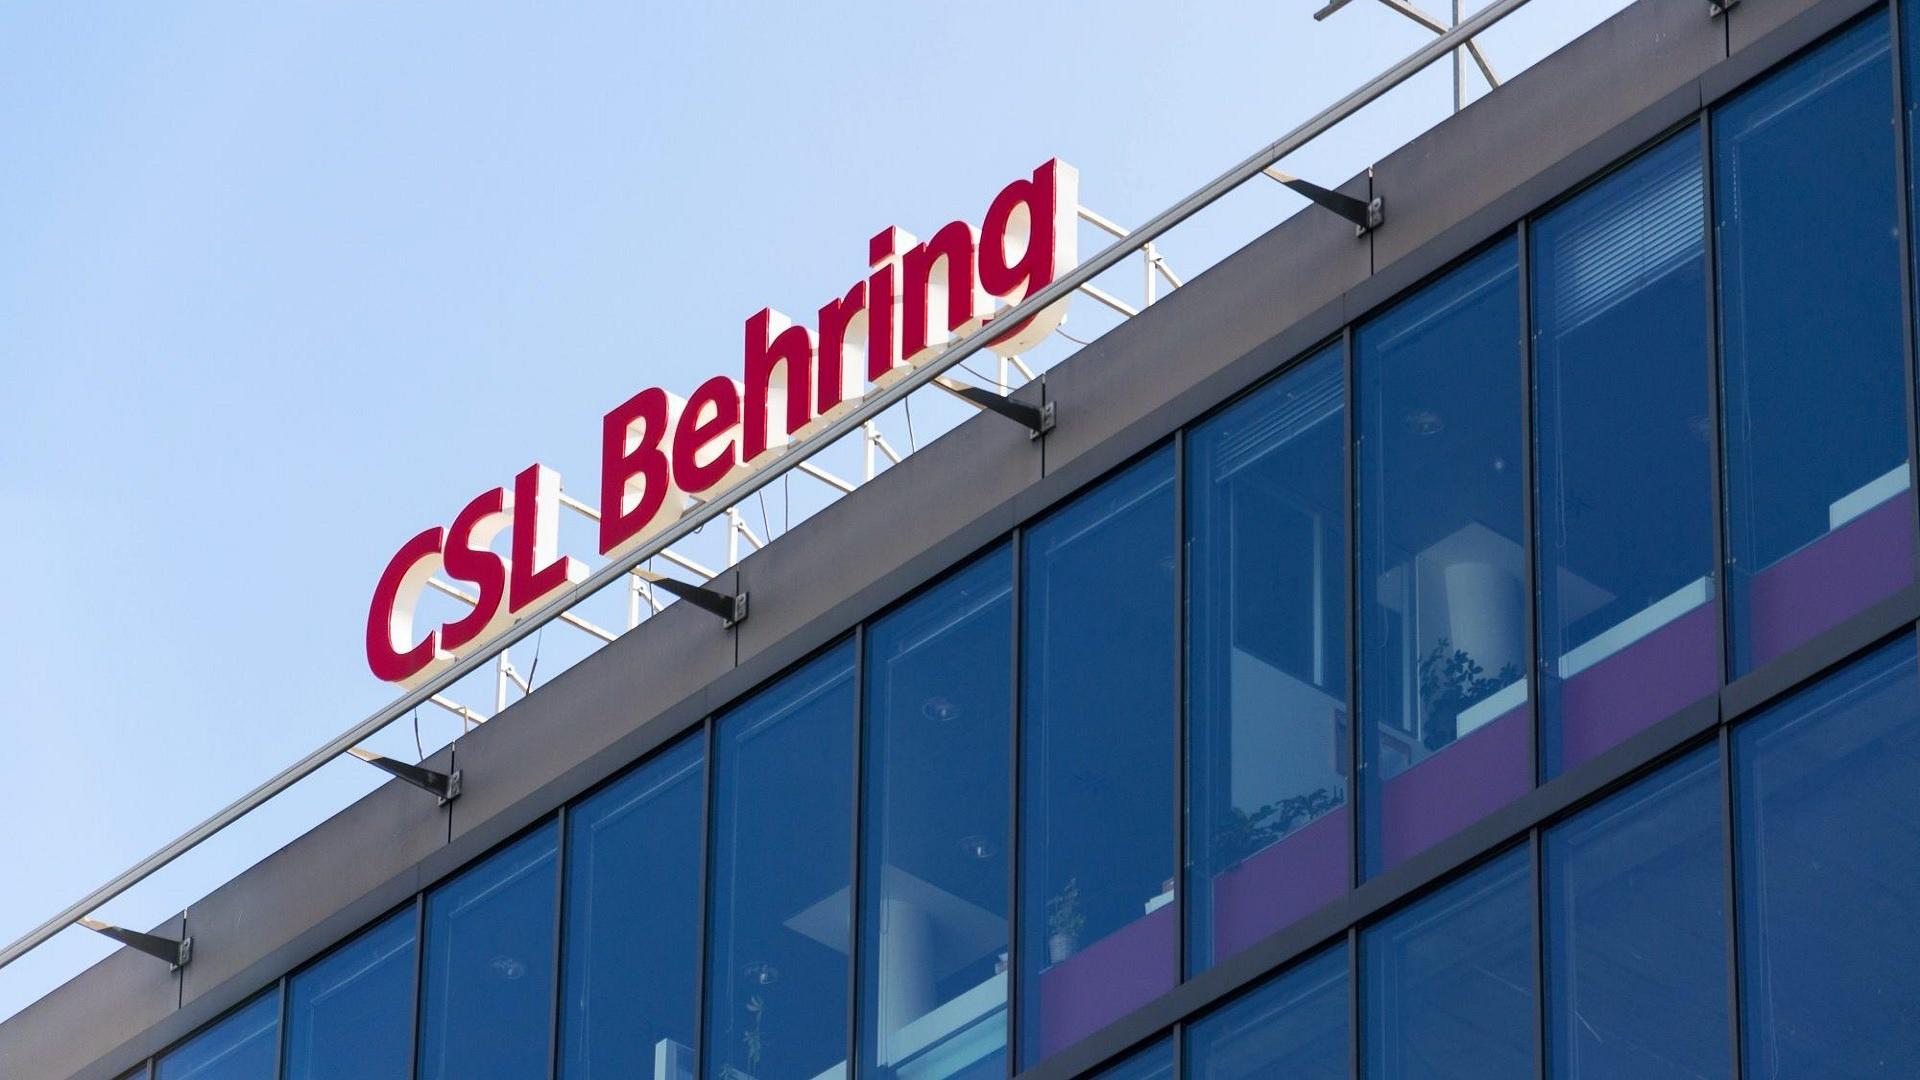 CSL Behring: Έναρξη Μελέτης Φάσης 3 για Θεραπεία έναντι της COVID-19